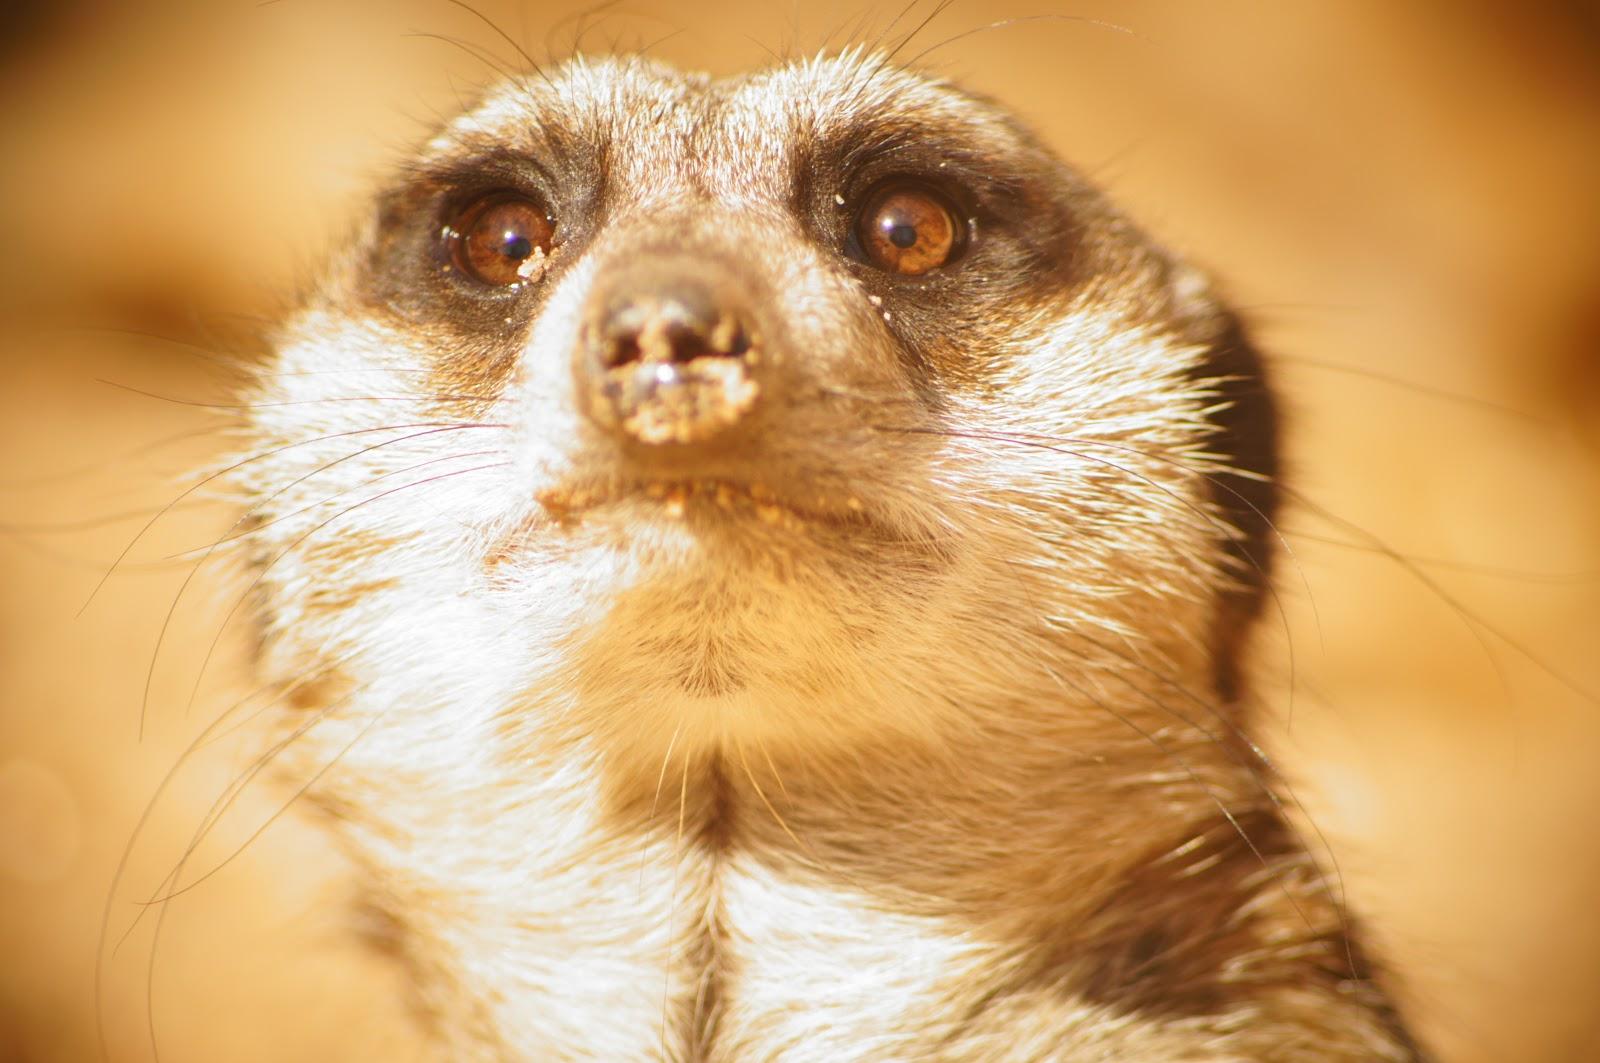 royalty free image of a meerkat